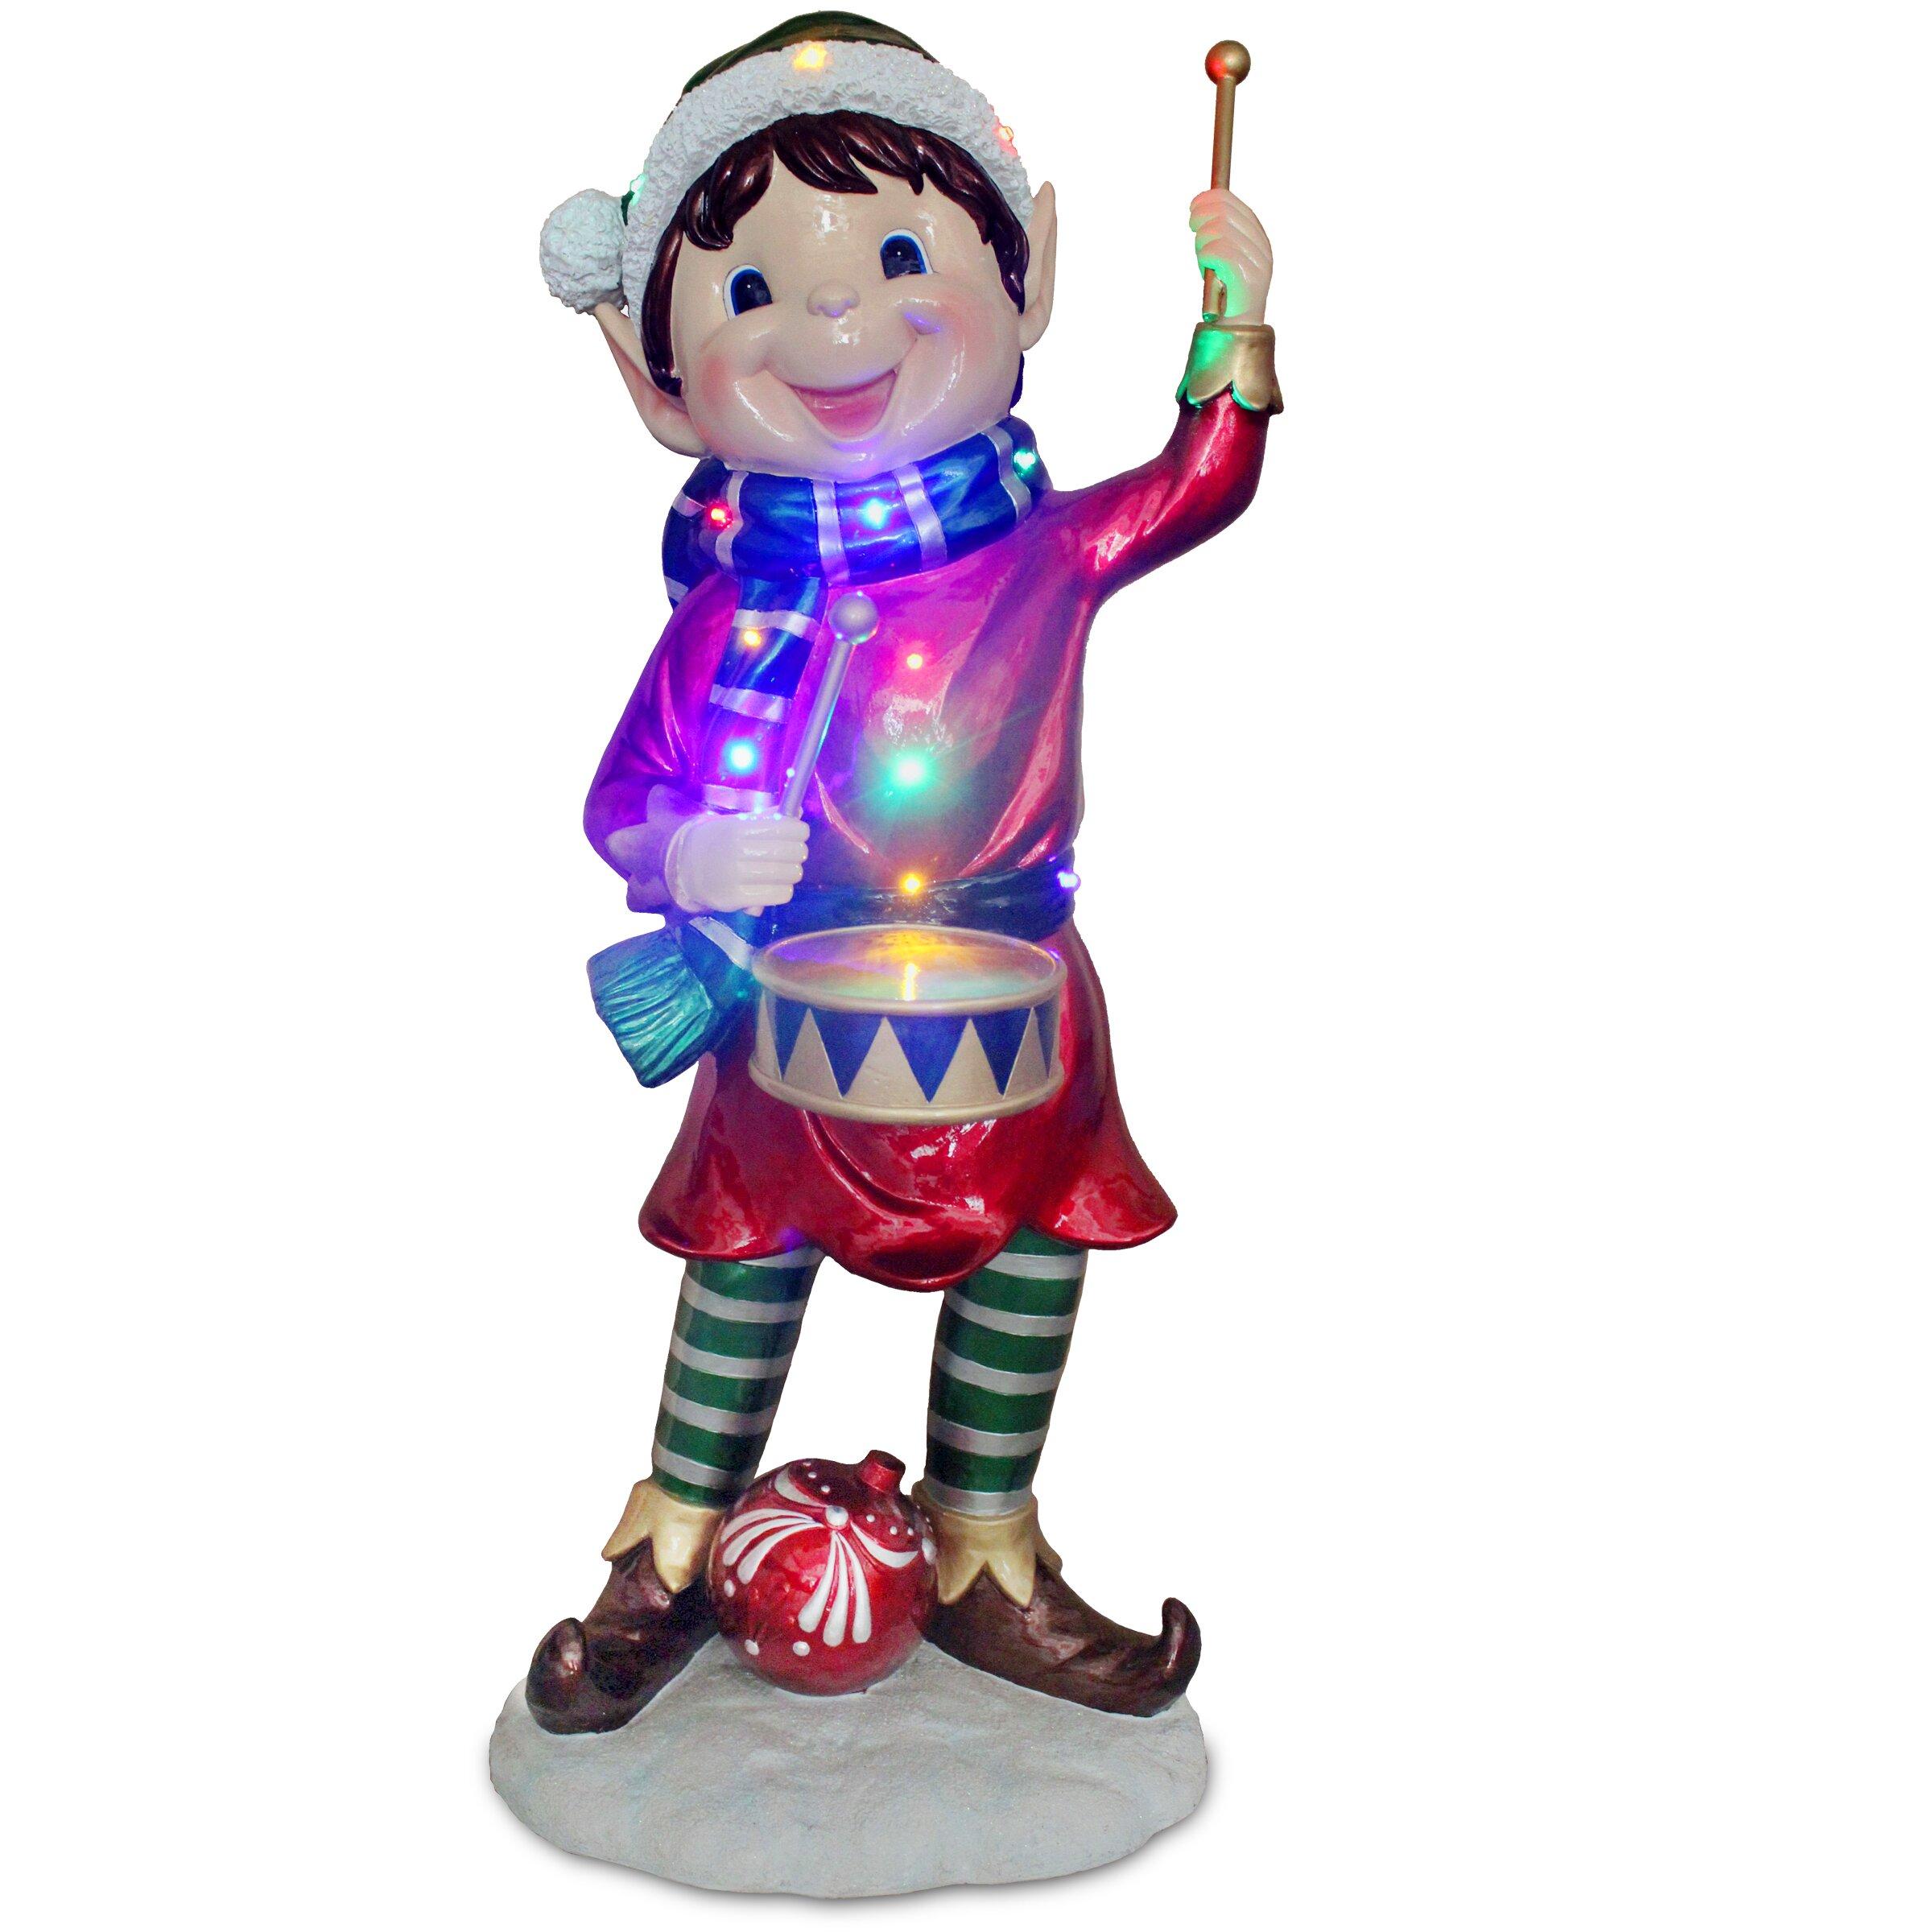 National Tree Co. Pre-Lit Pixie Elf Christmas Decoration